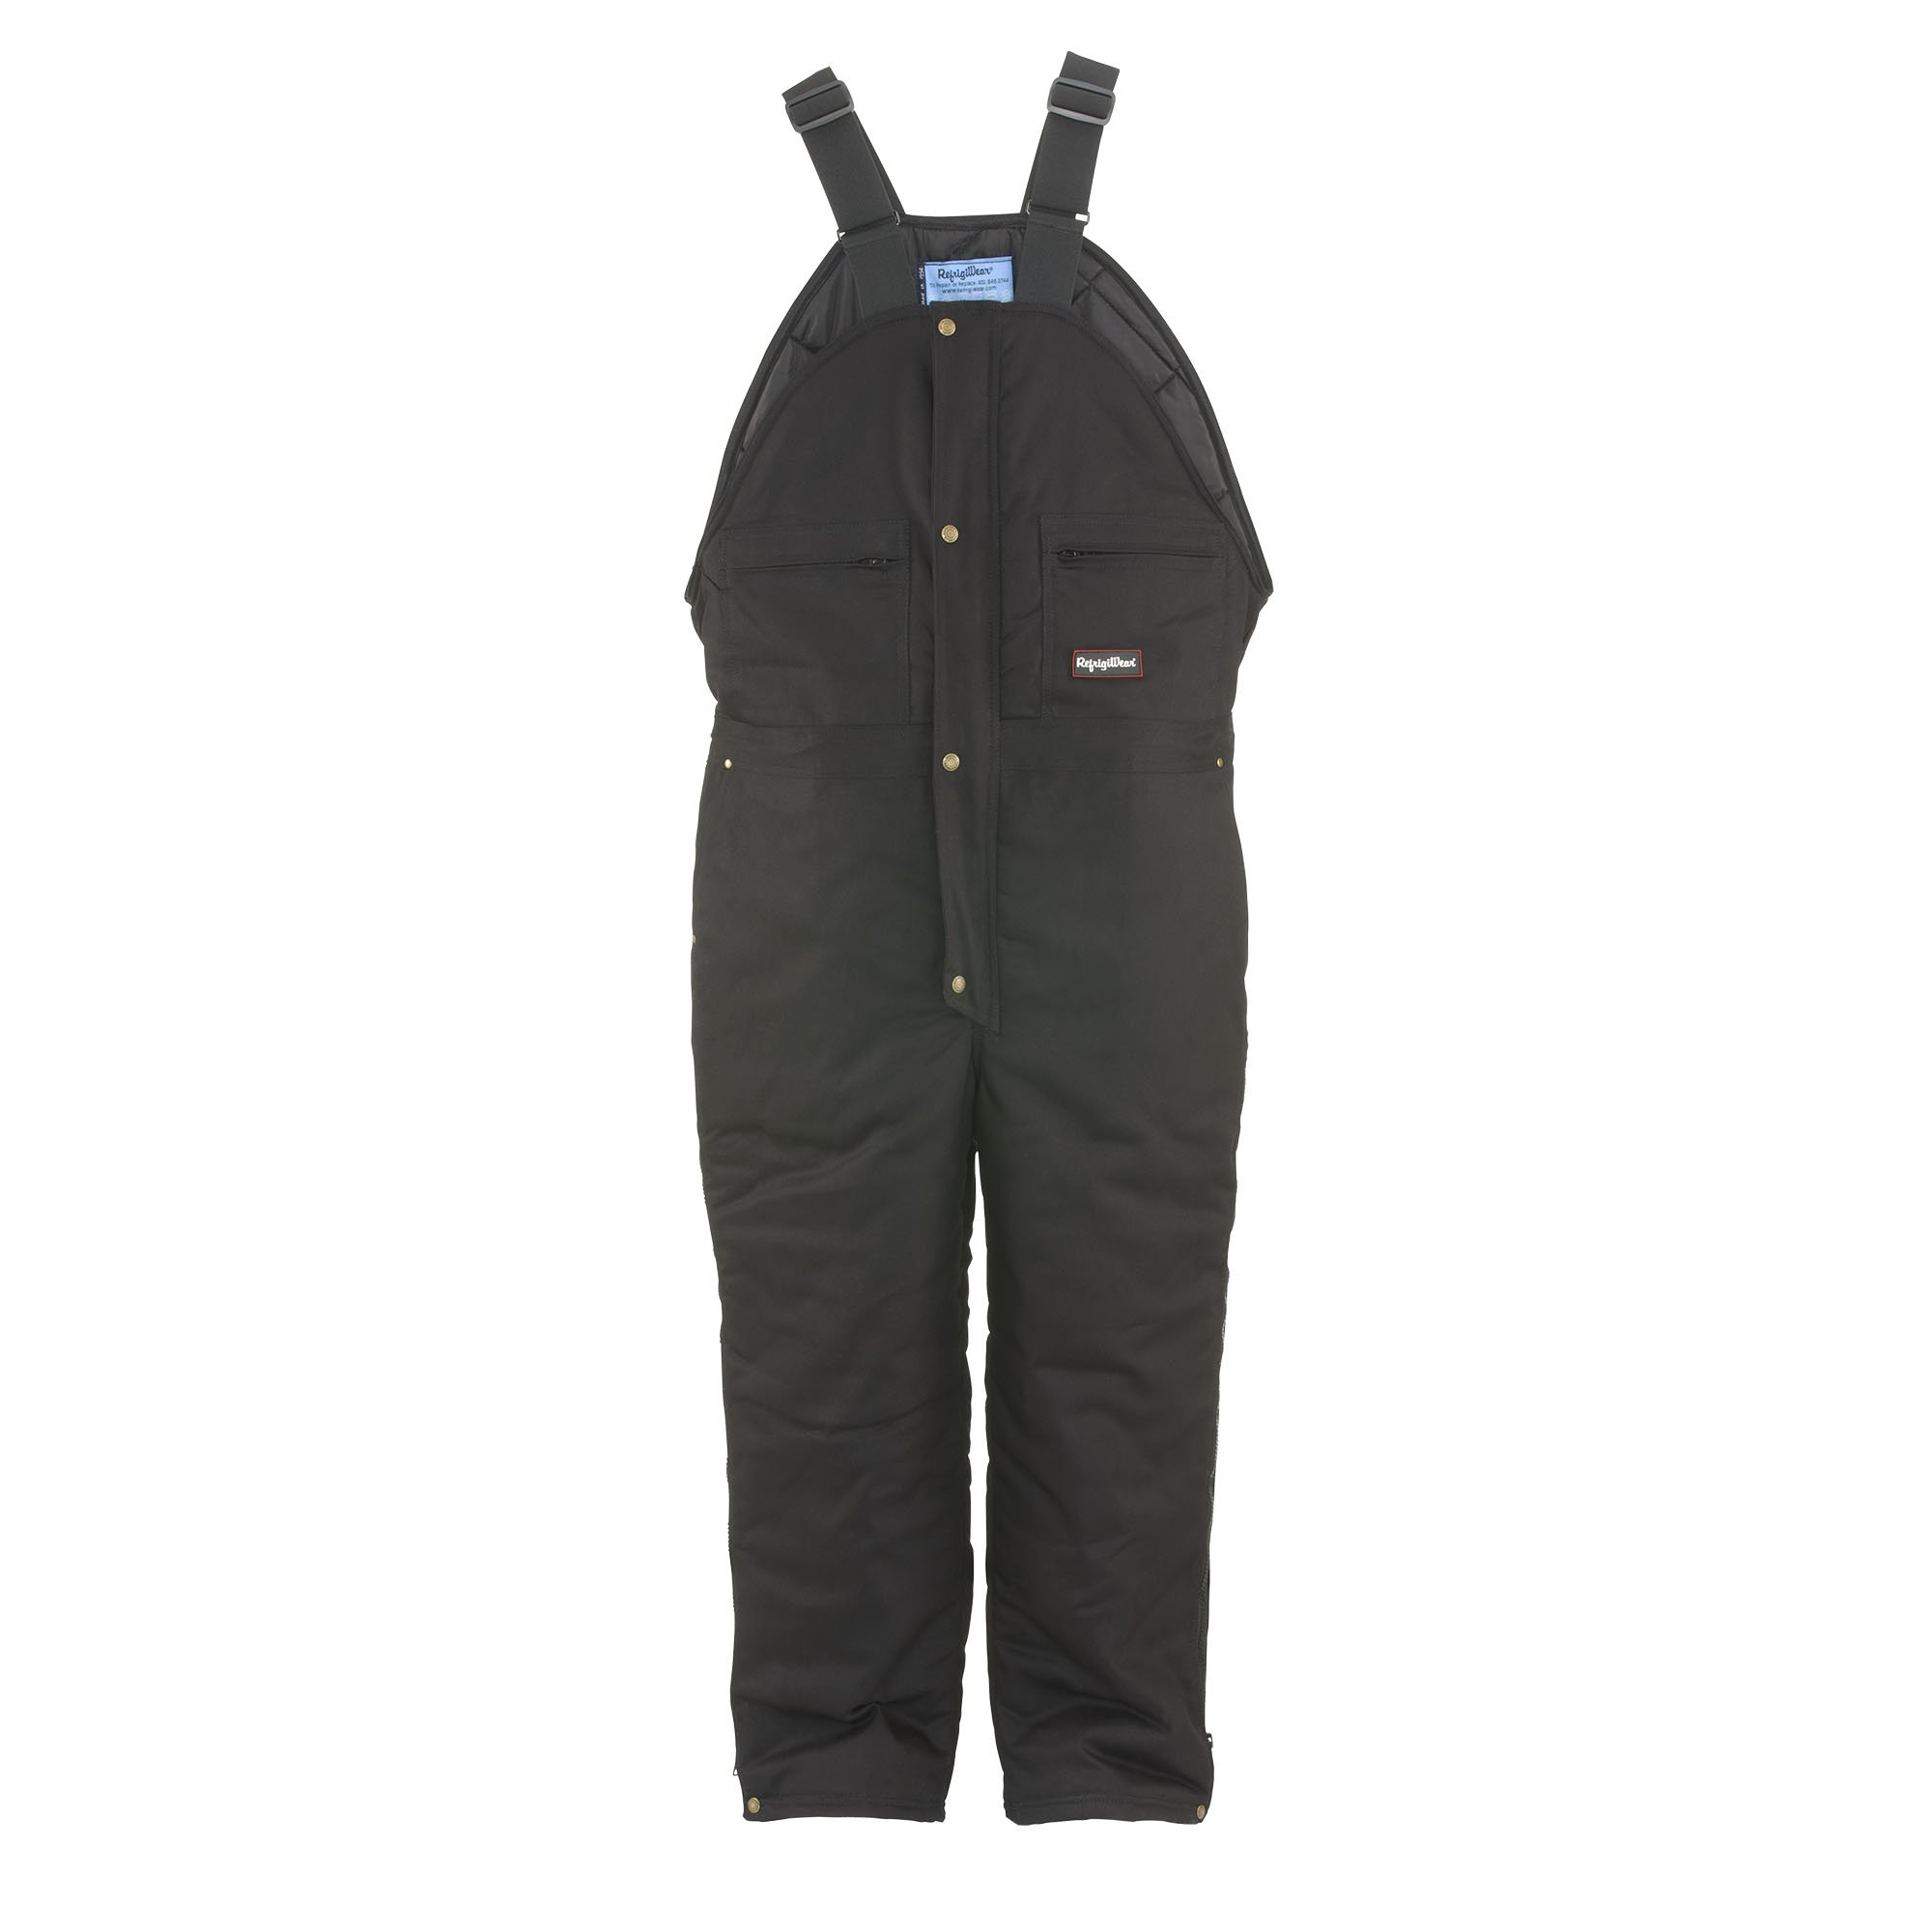 RefrigiWear Men's Comfortguard Denim High Bib Black 4XL Tall